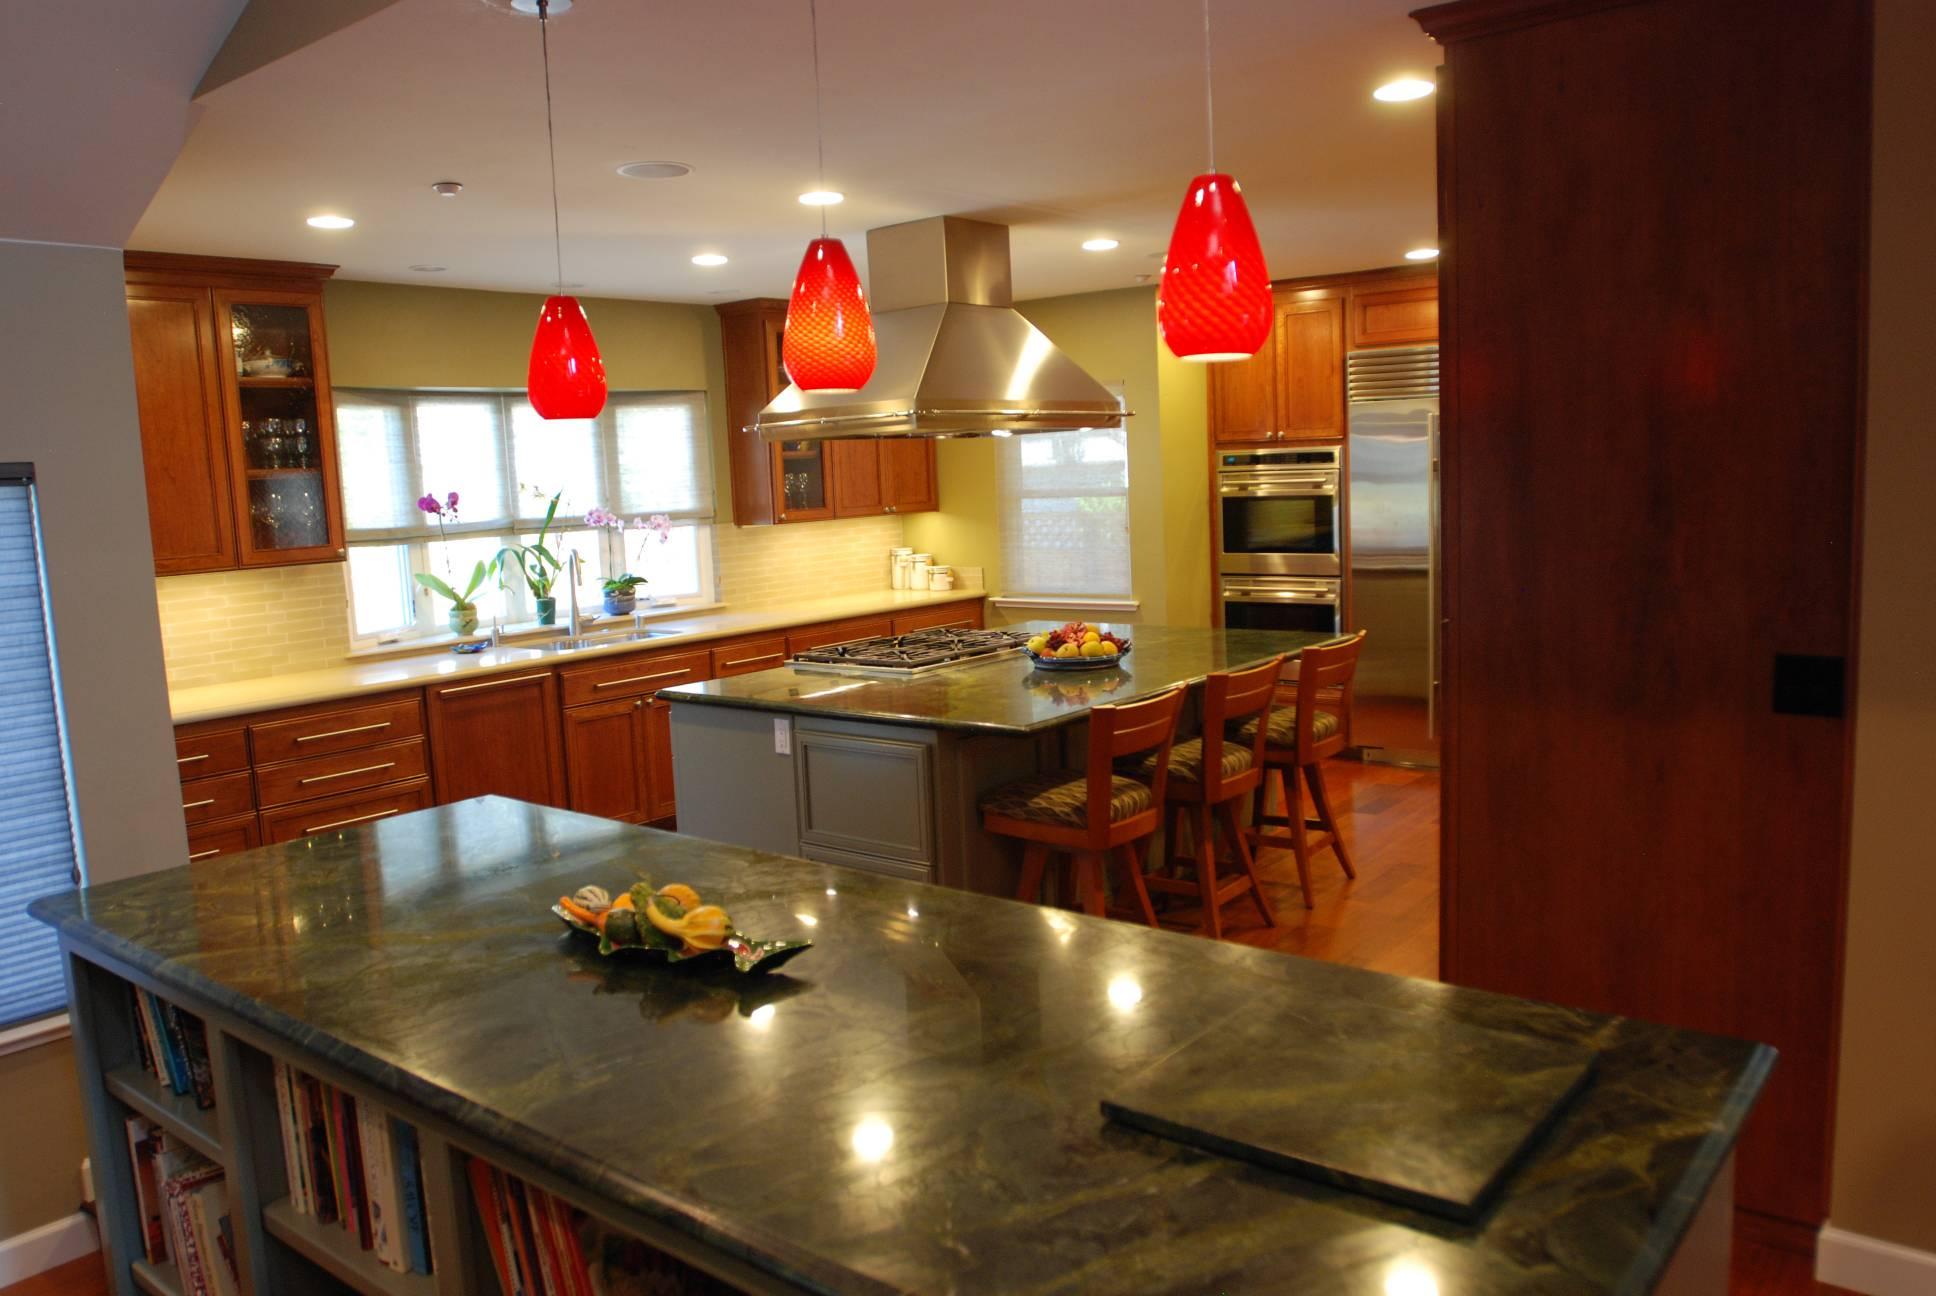 Open Concept Kitchen Large Island, Architect work, Interior design work, Mountain View